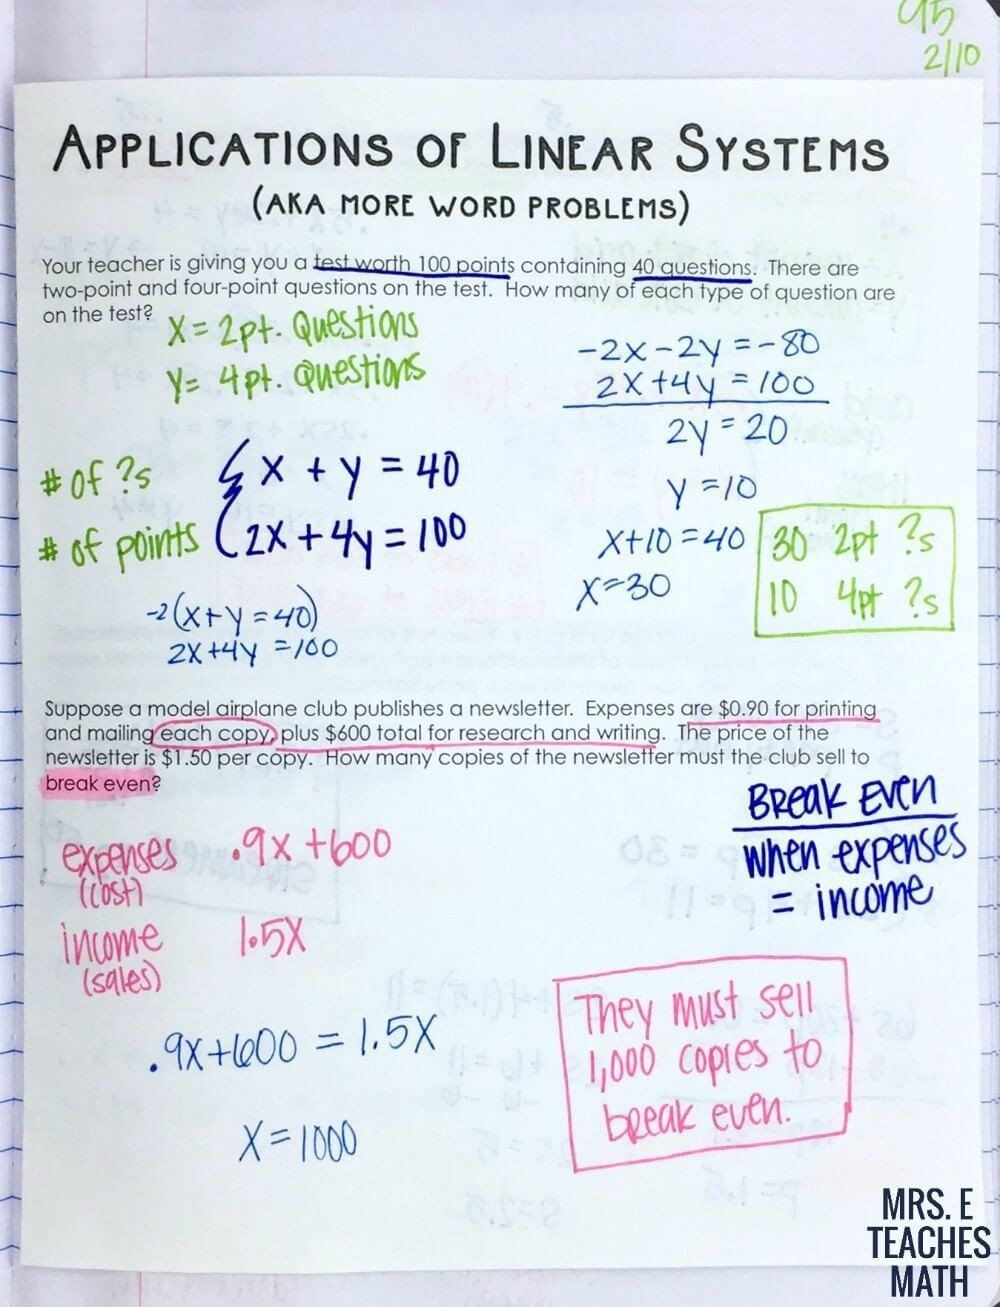 Solving Equations Word Problems Worksheet Systems Of Linear Equations Word Problems Inb Page In 2020 Word Problems Word Problem Worksheets Math About Me